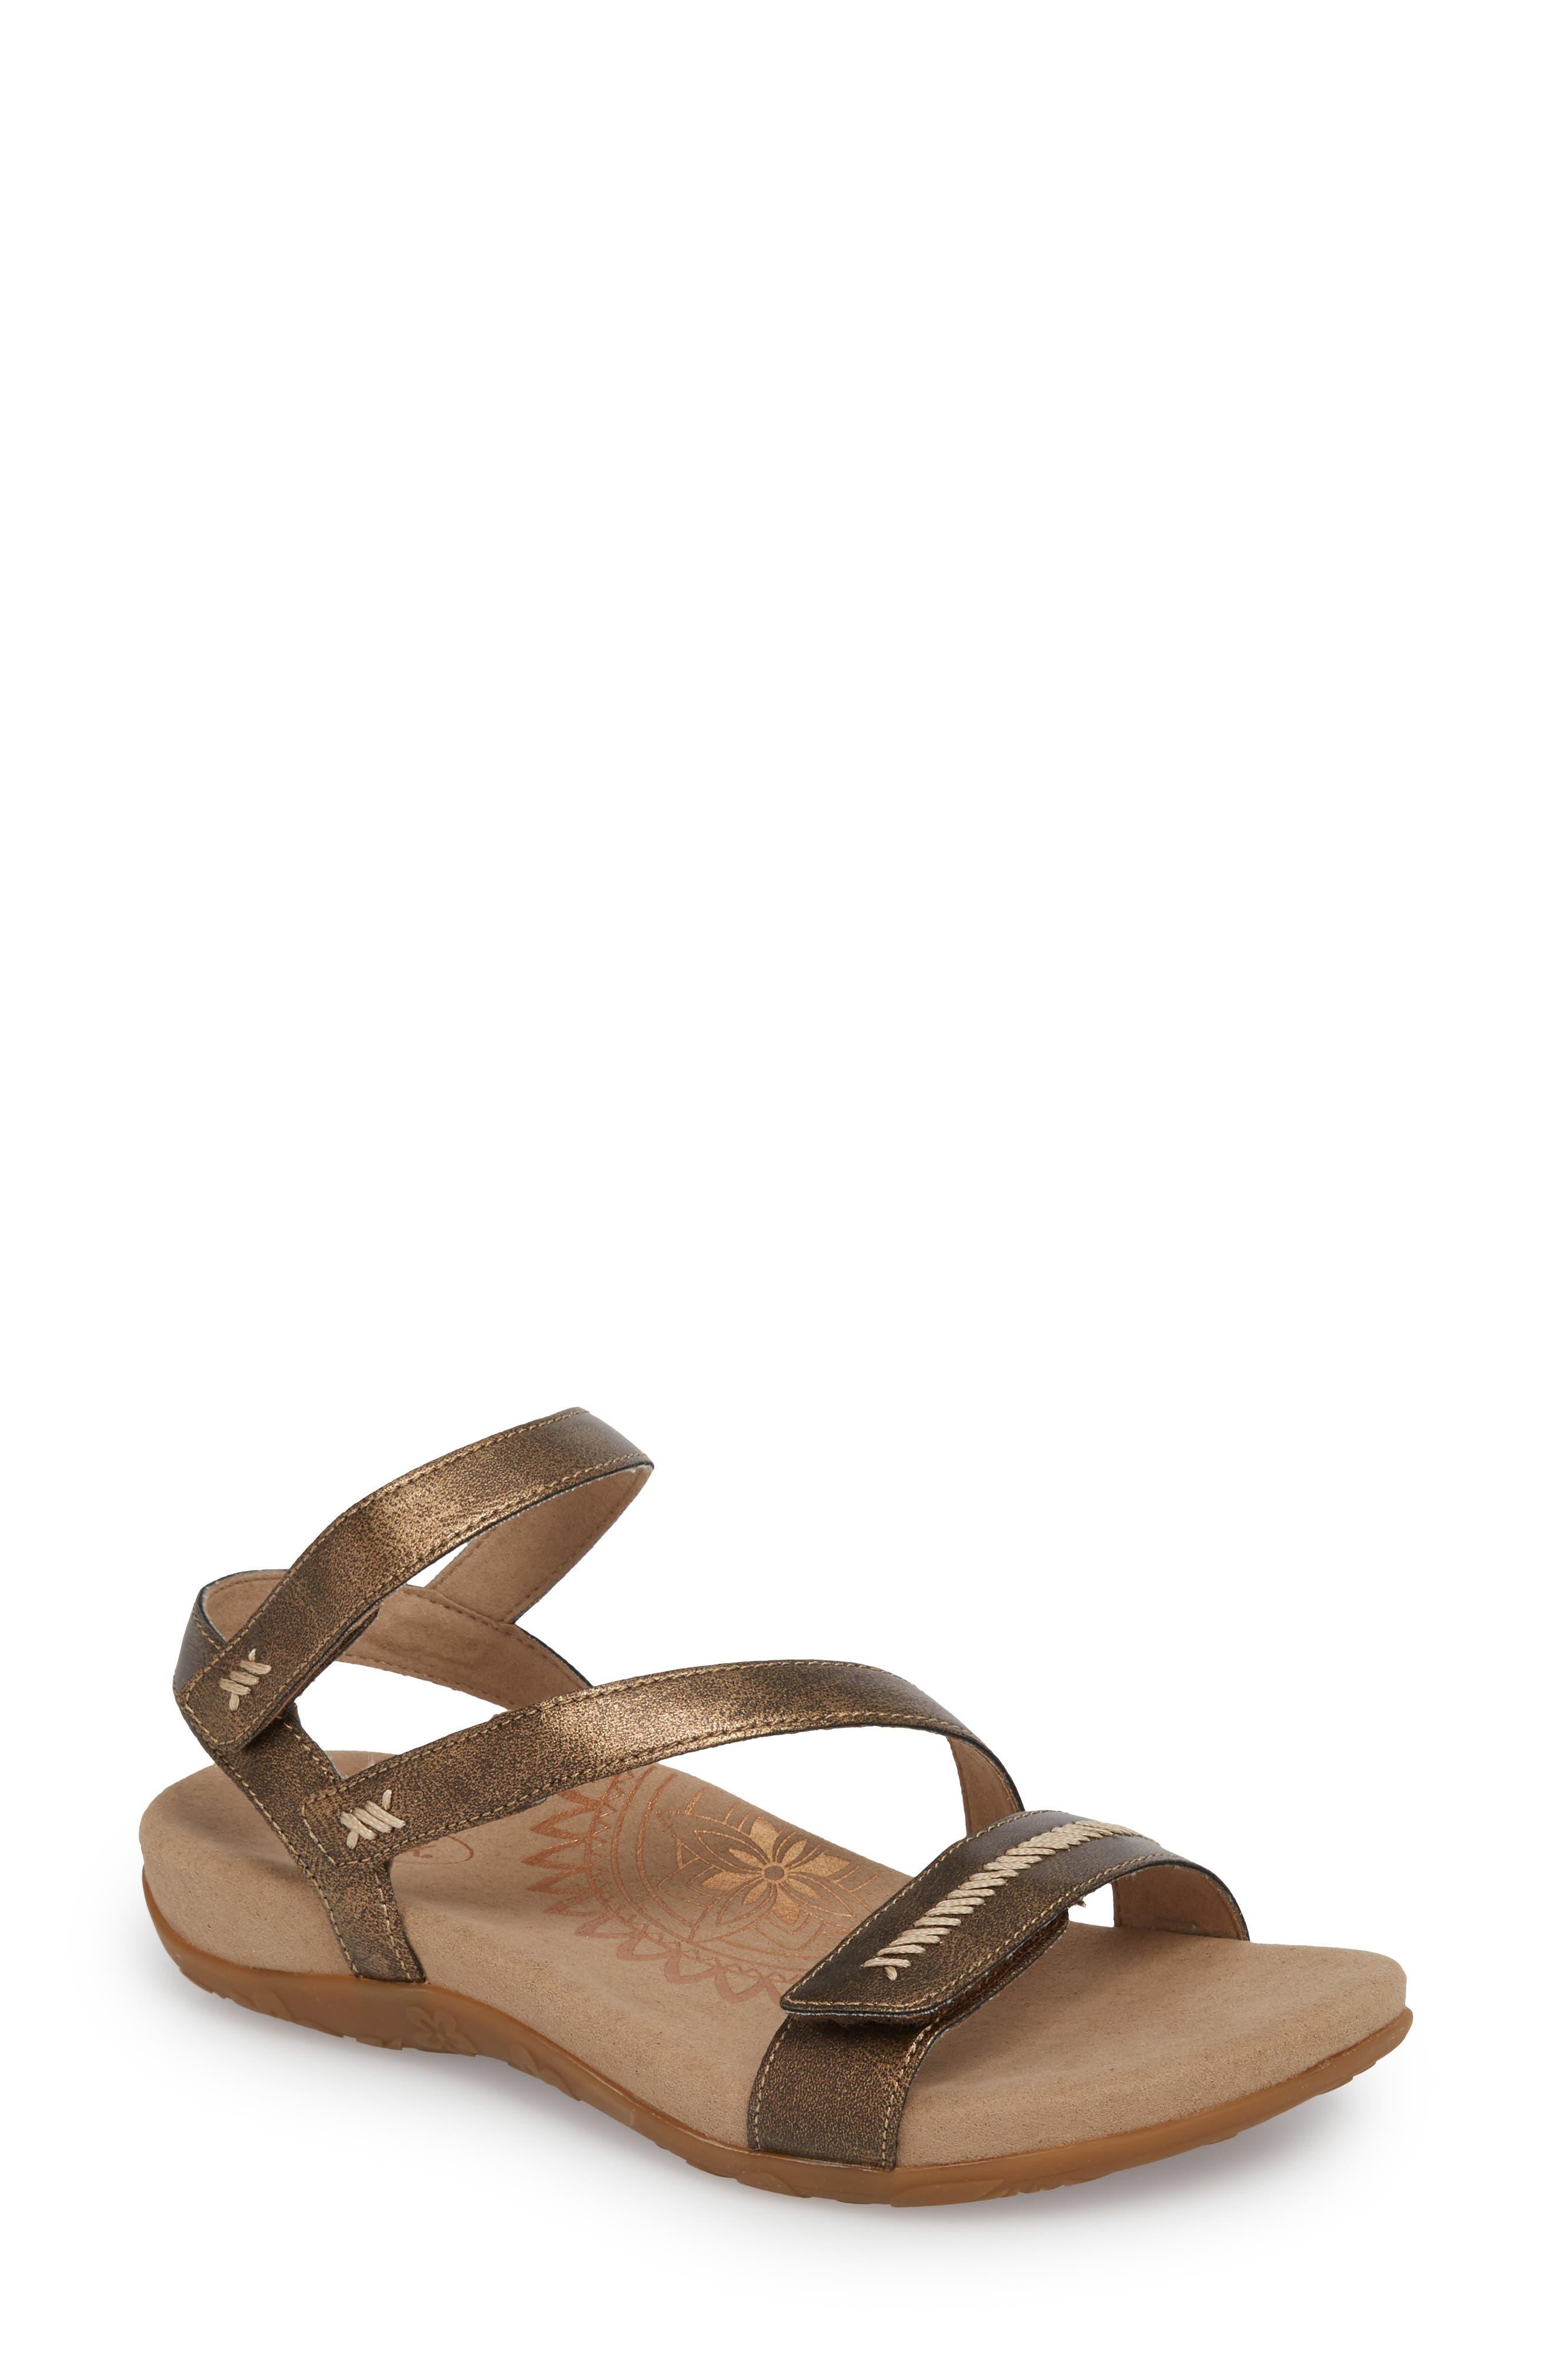 Gabby Sandal,                         Main,                         color, Bronze Leather